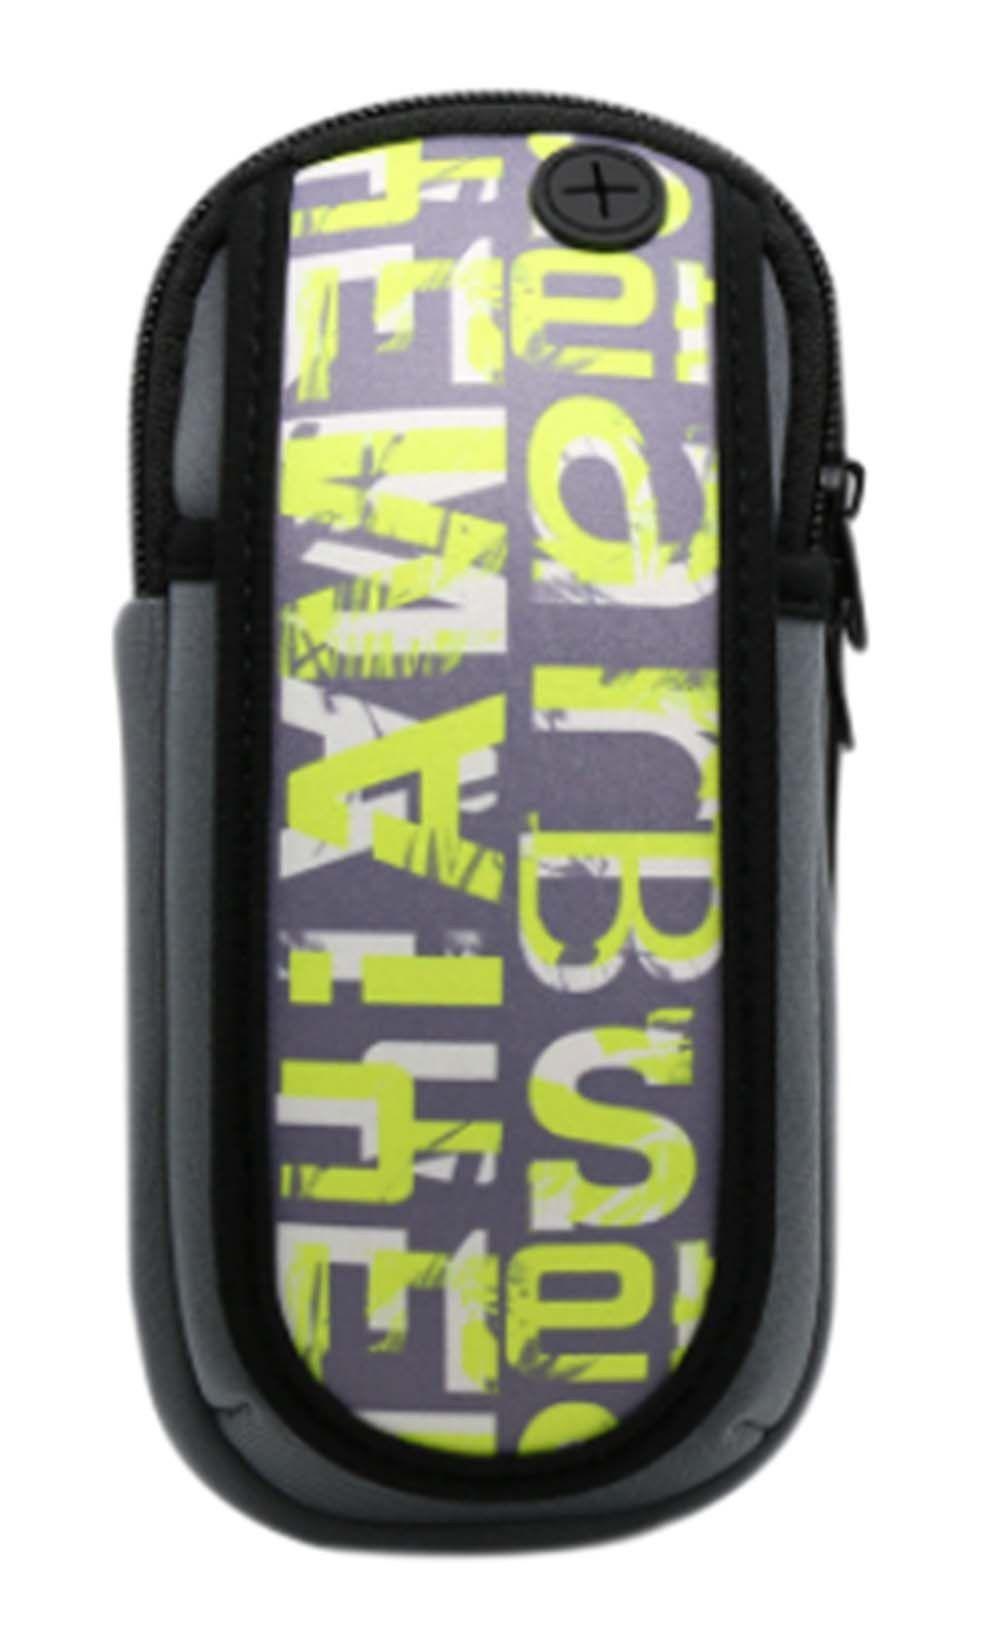 Alphabet Outdoor Sports Jogging Arm Package Mobile Phone Wrist Bag